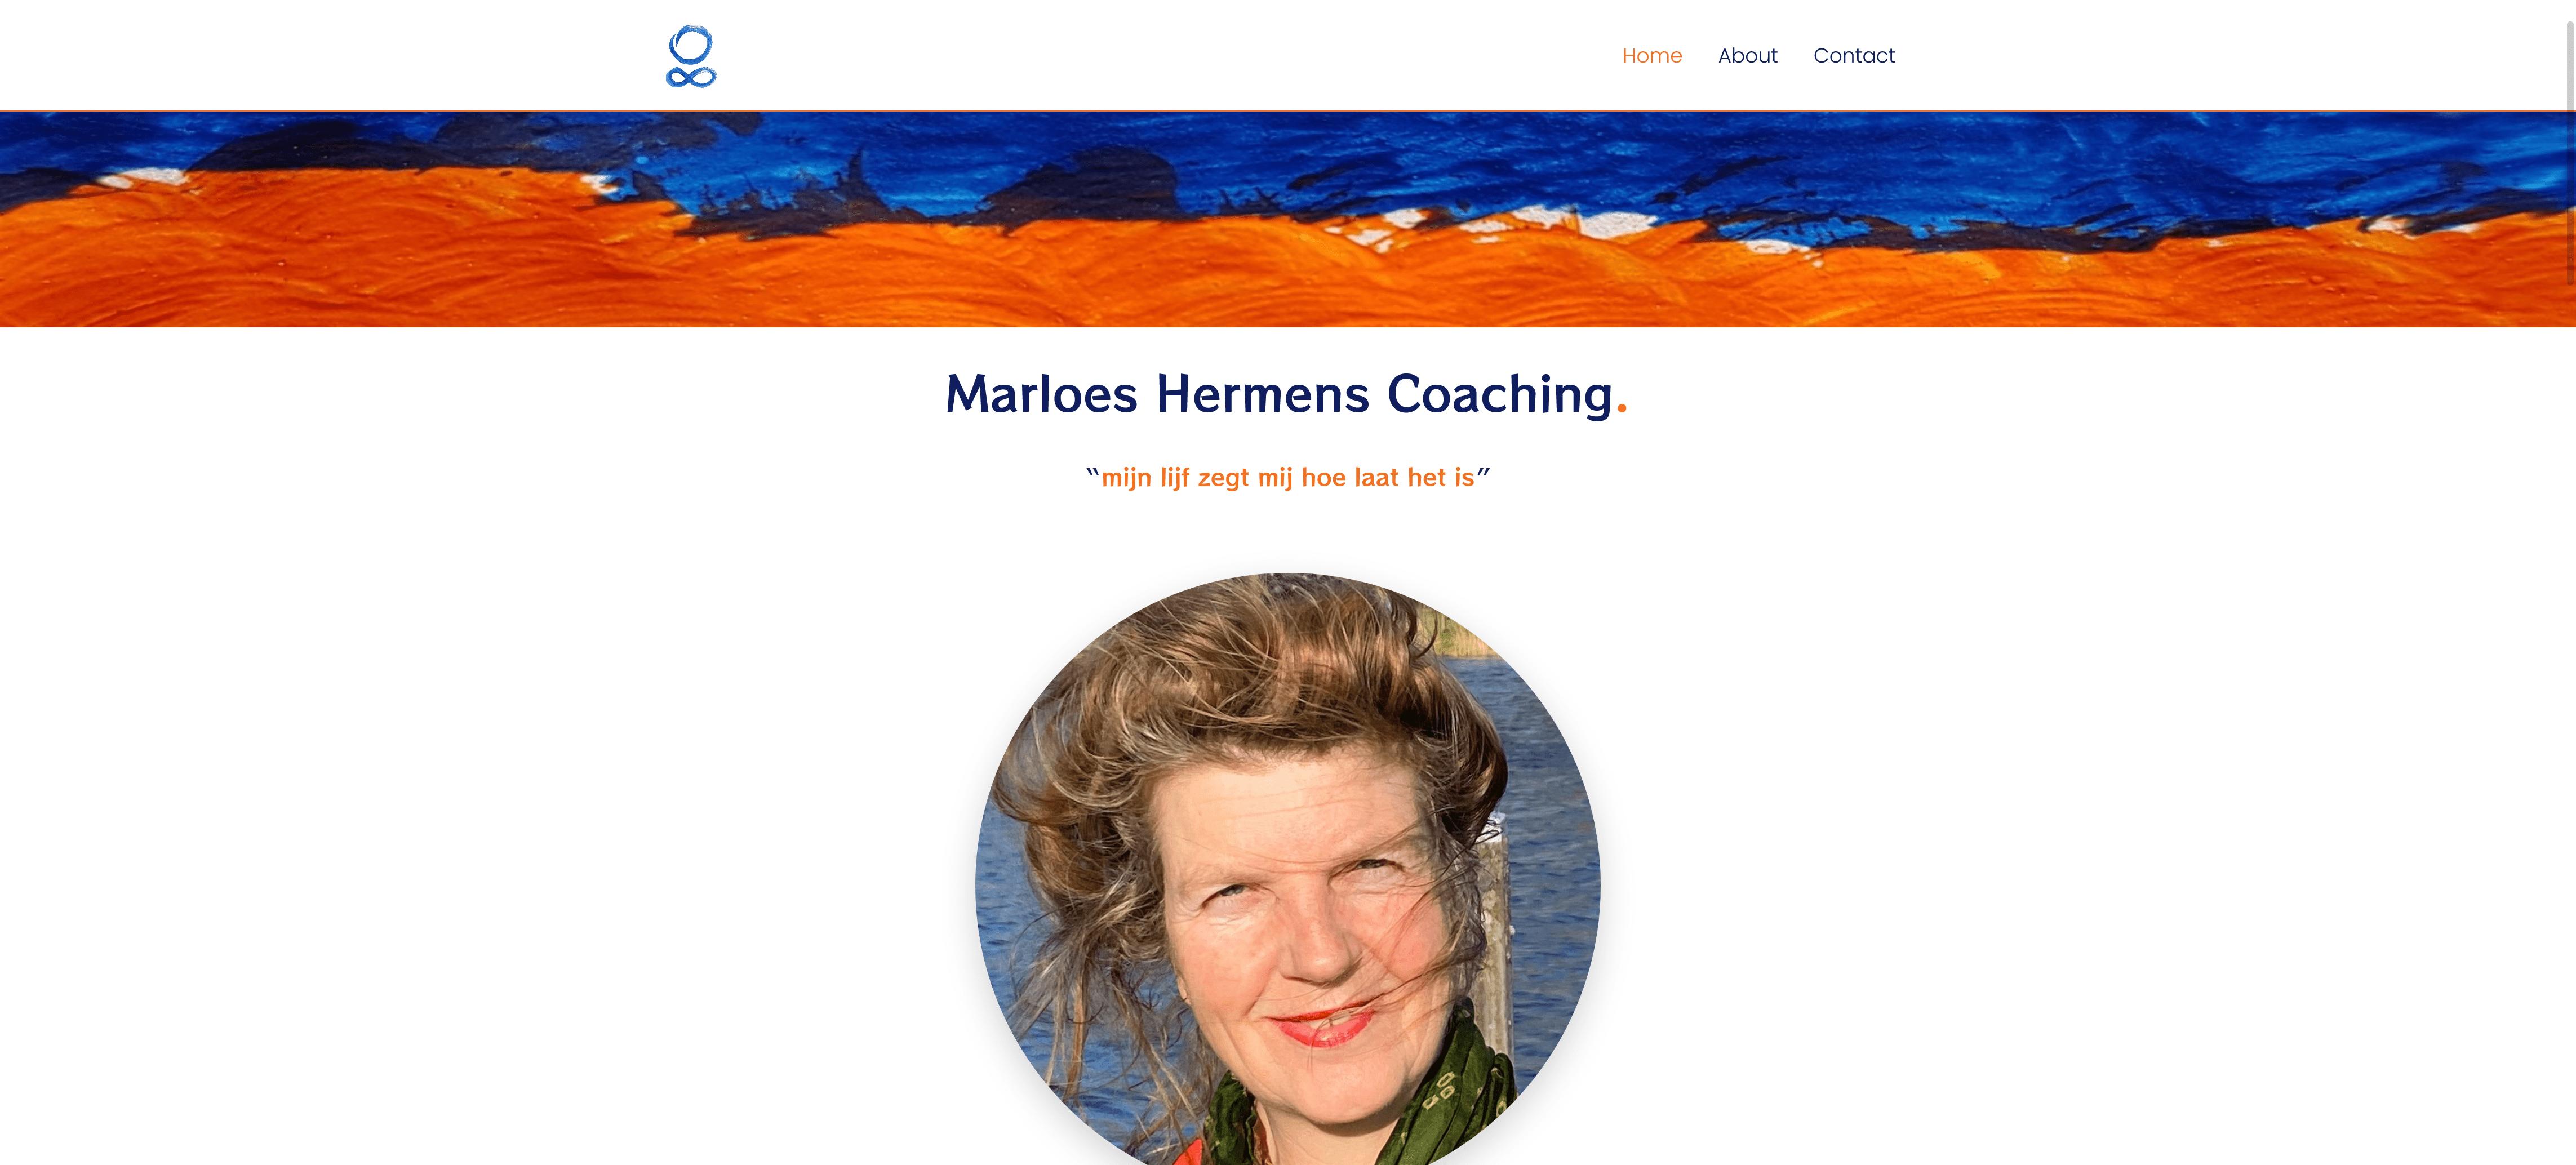 Marloes Hermens Coaching